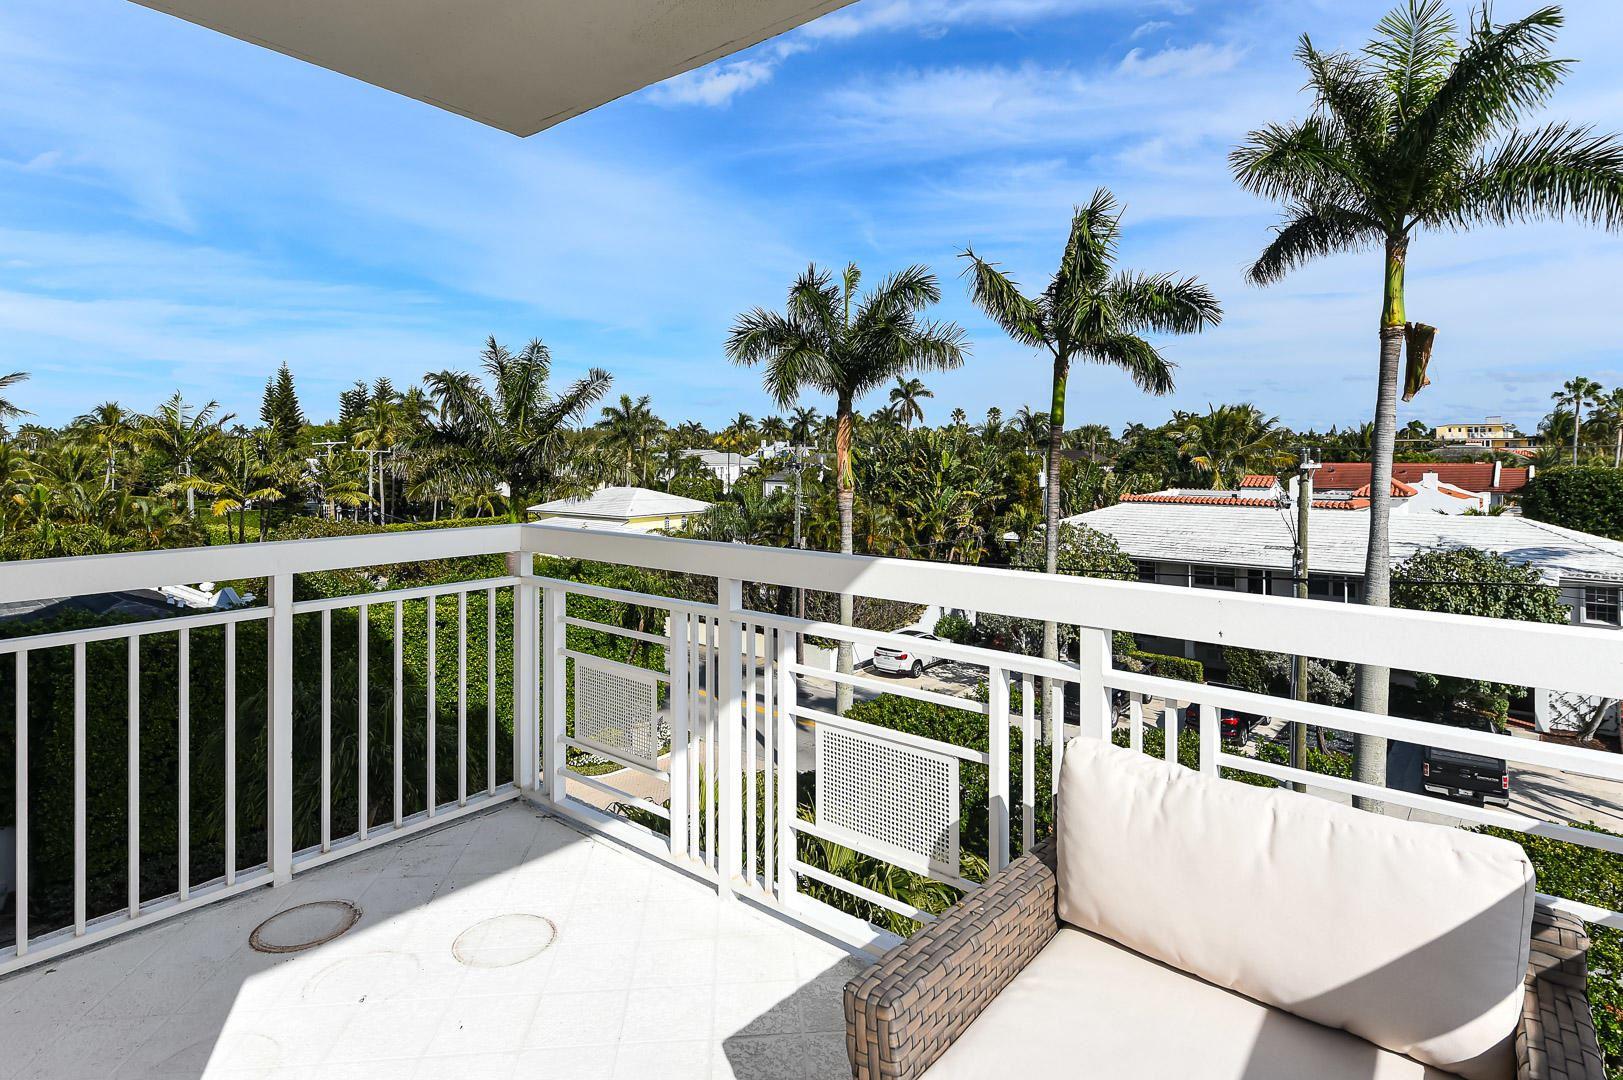 Photo of 250 Bradley 402 Place #402, Palm Beach, FL 33480 (MLS # RX-10685752)